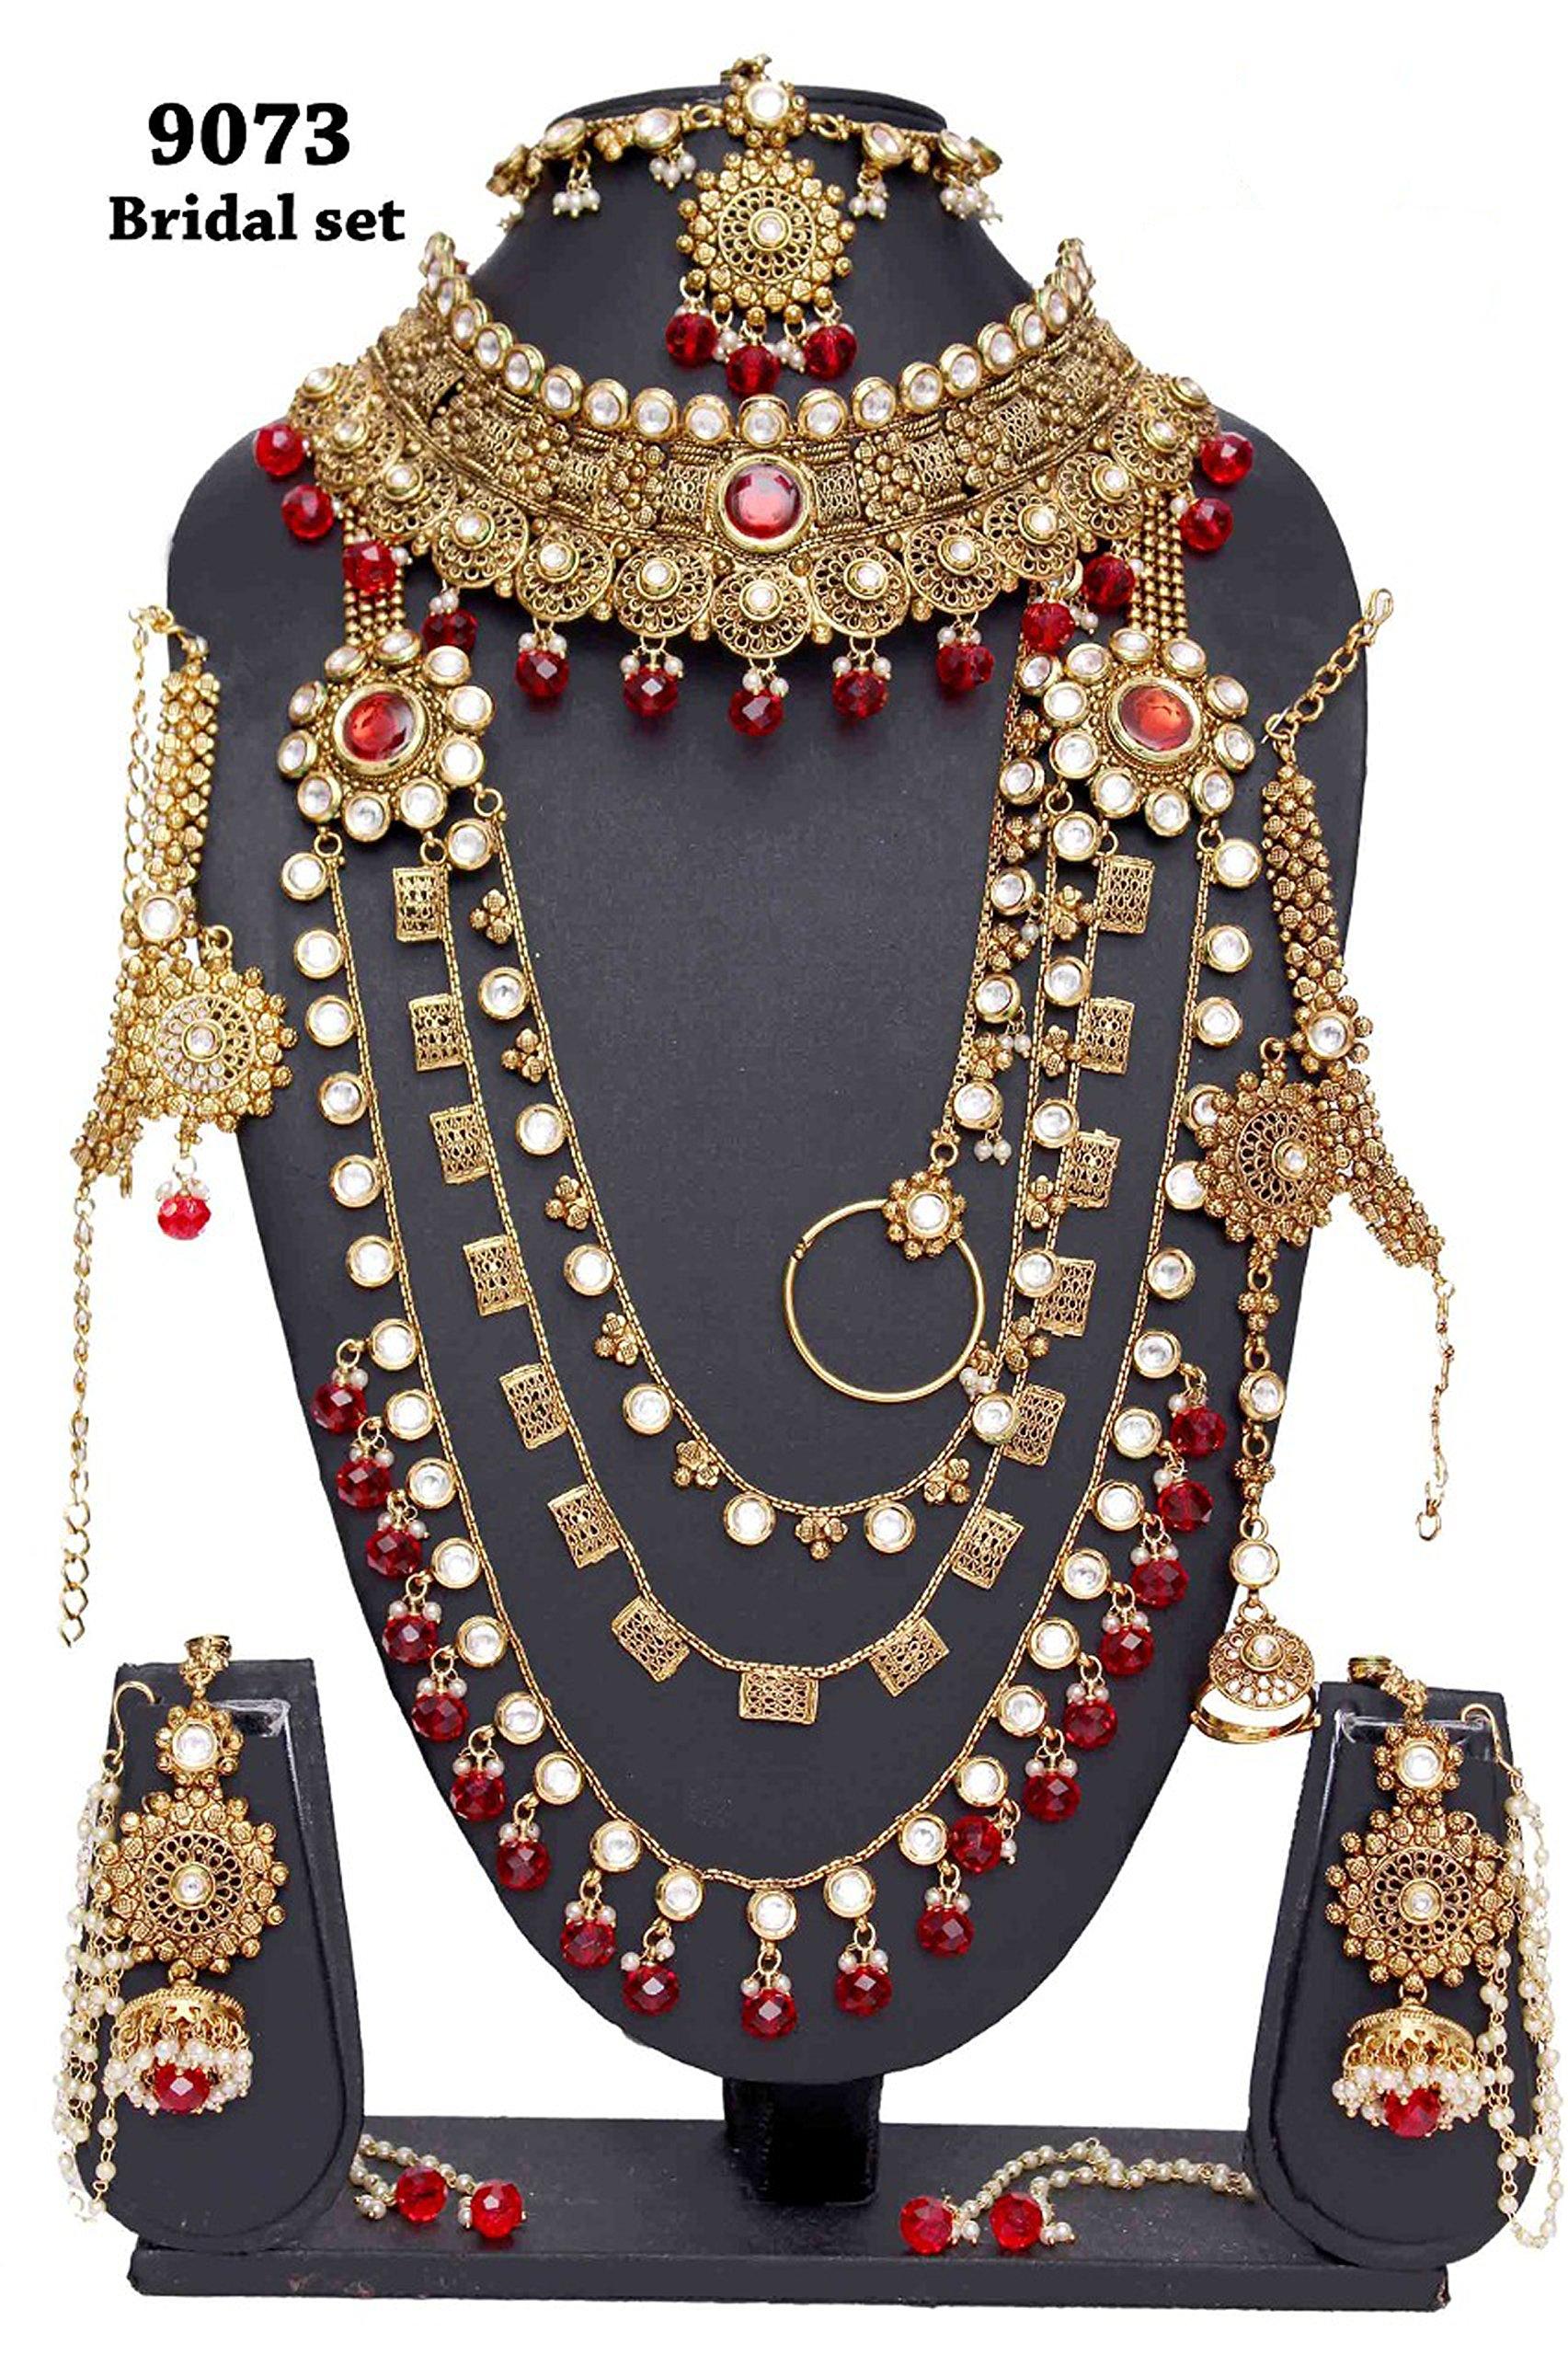 Ethnic Fabulous Indian Style Golden Plated Polki Kundan Stone Indian Necklace Earrings Bridal Set Partywear Jewelry